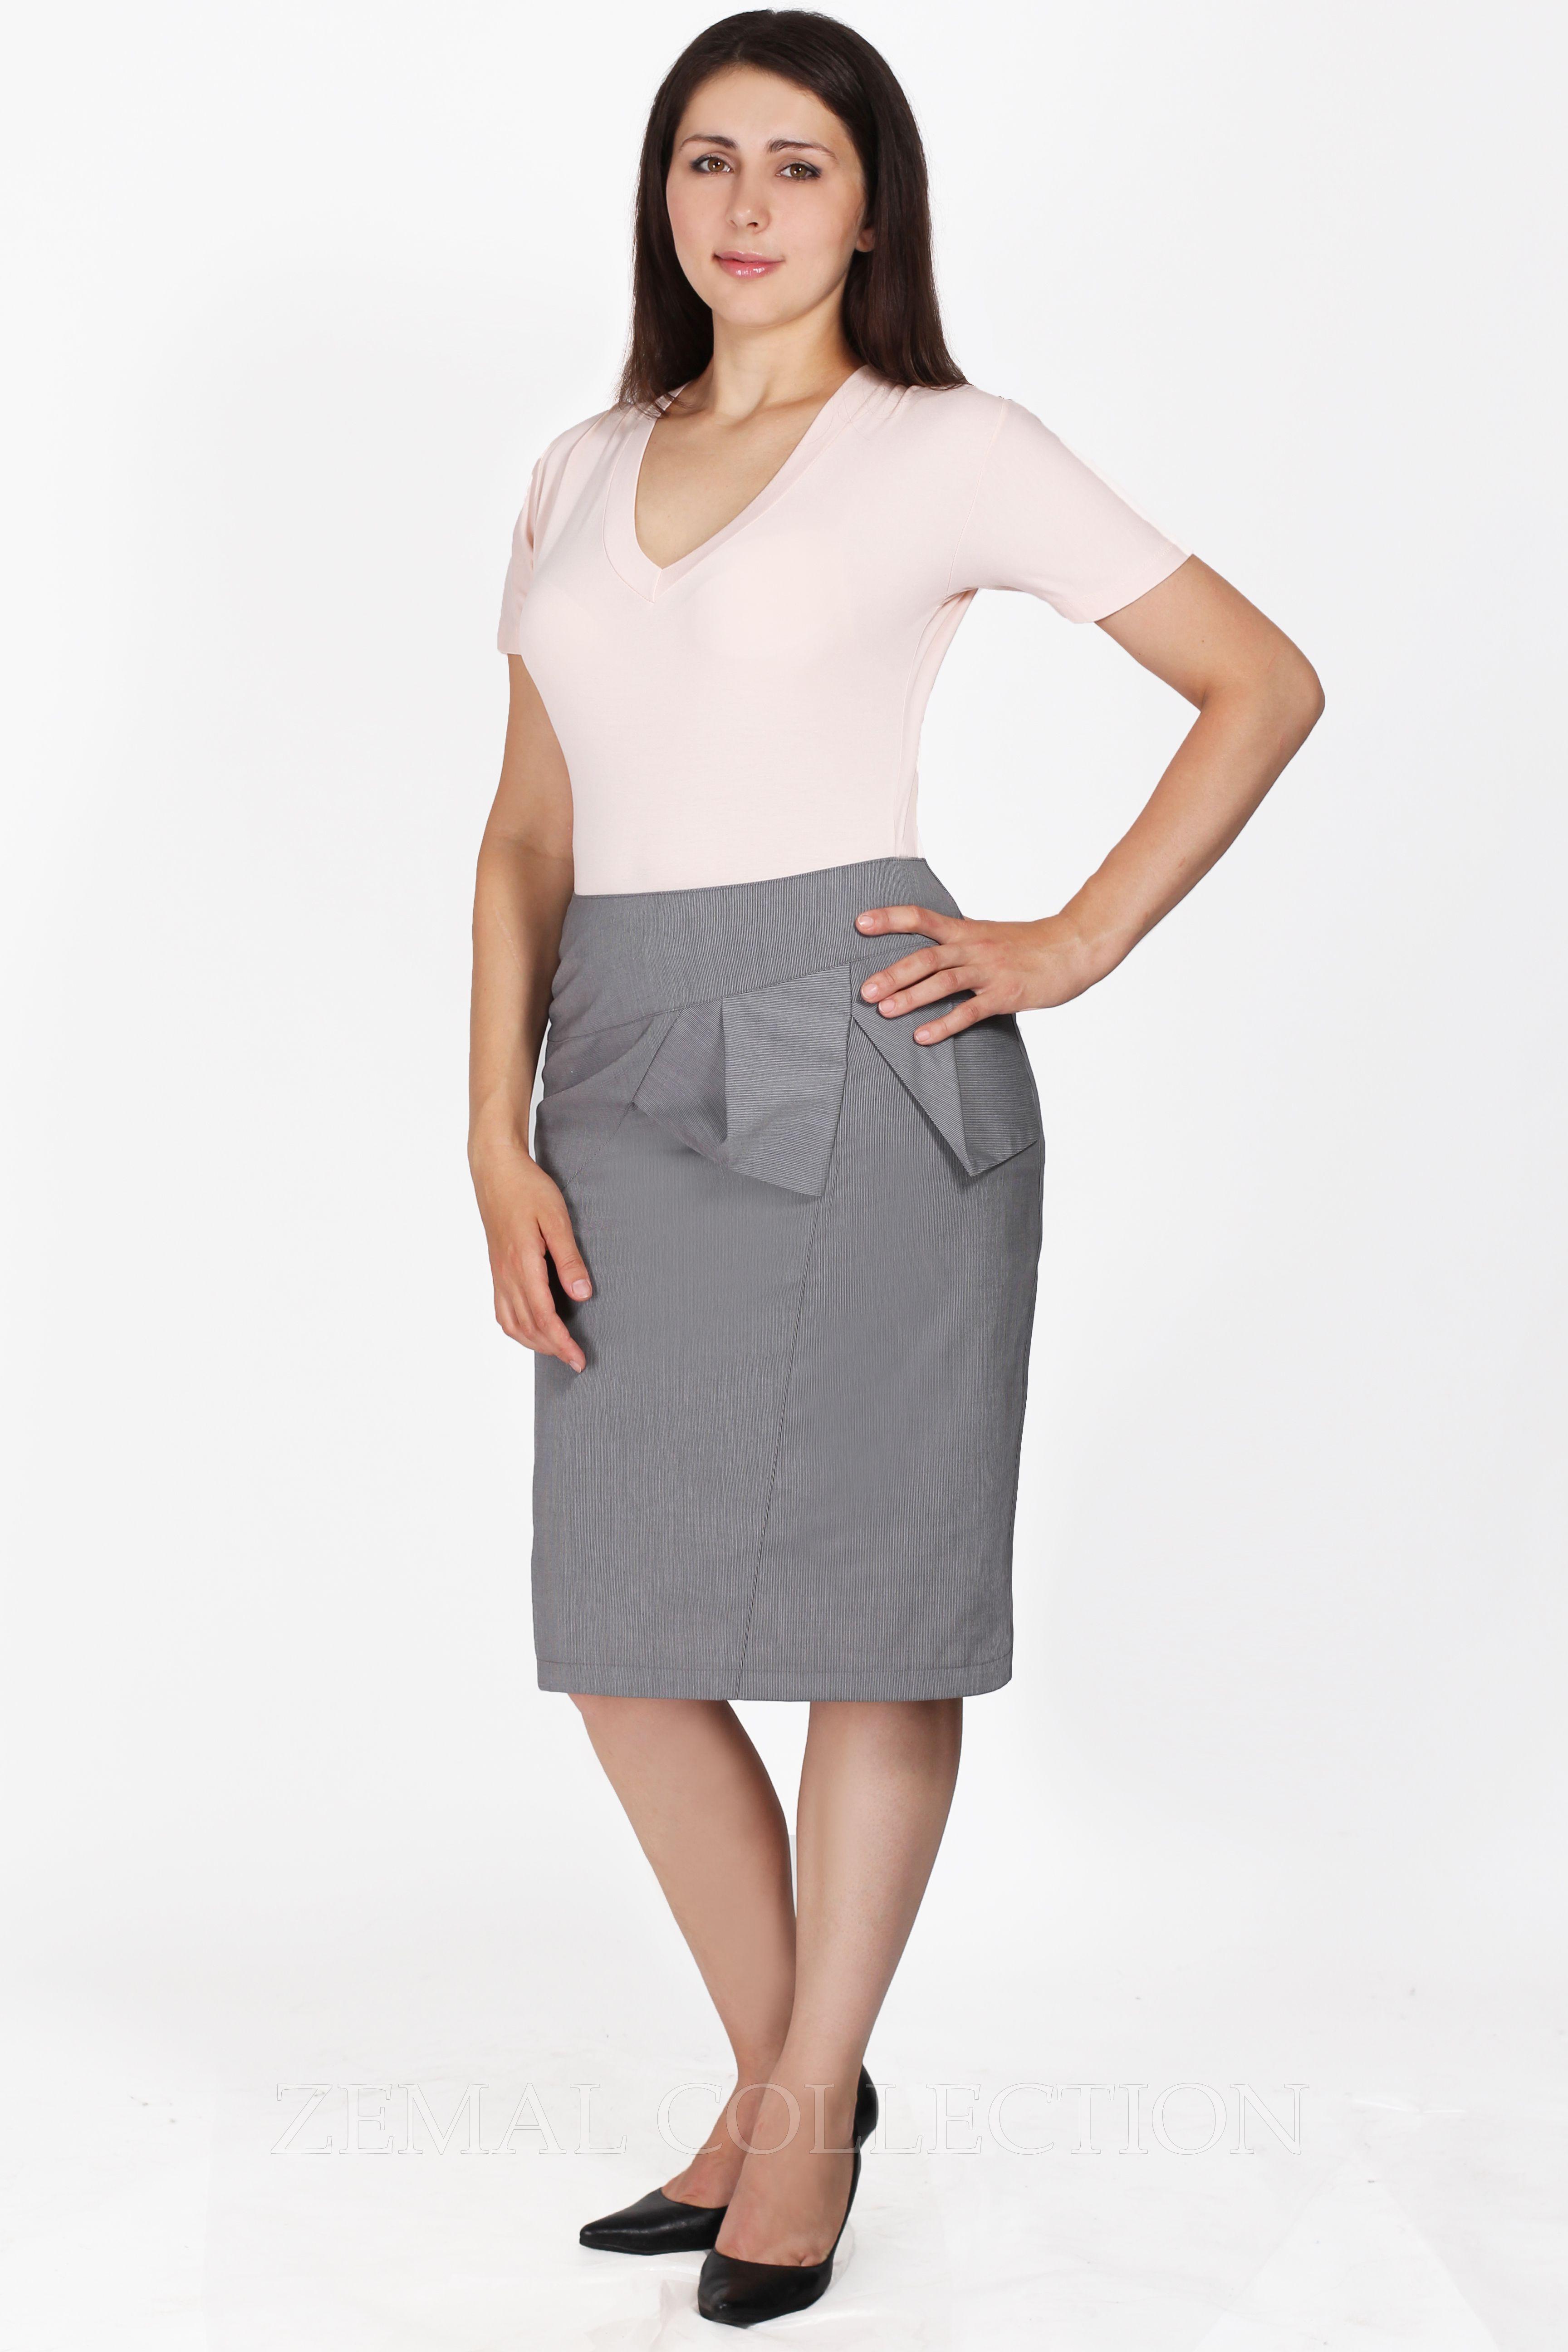 юбки оптом от производителя в одессе: